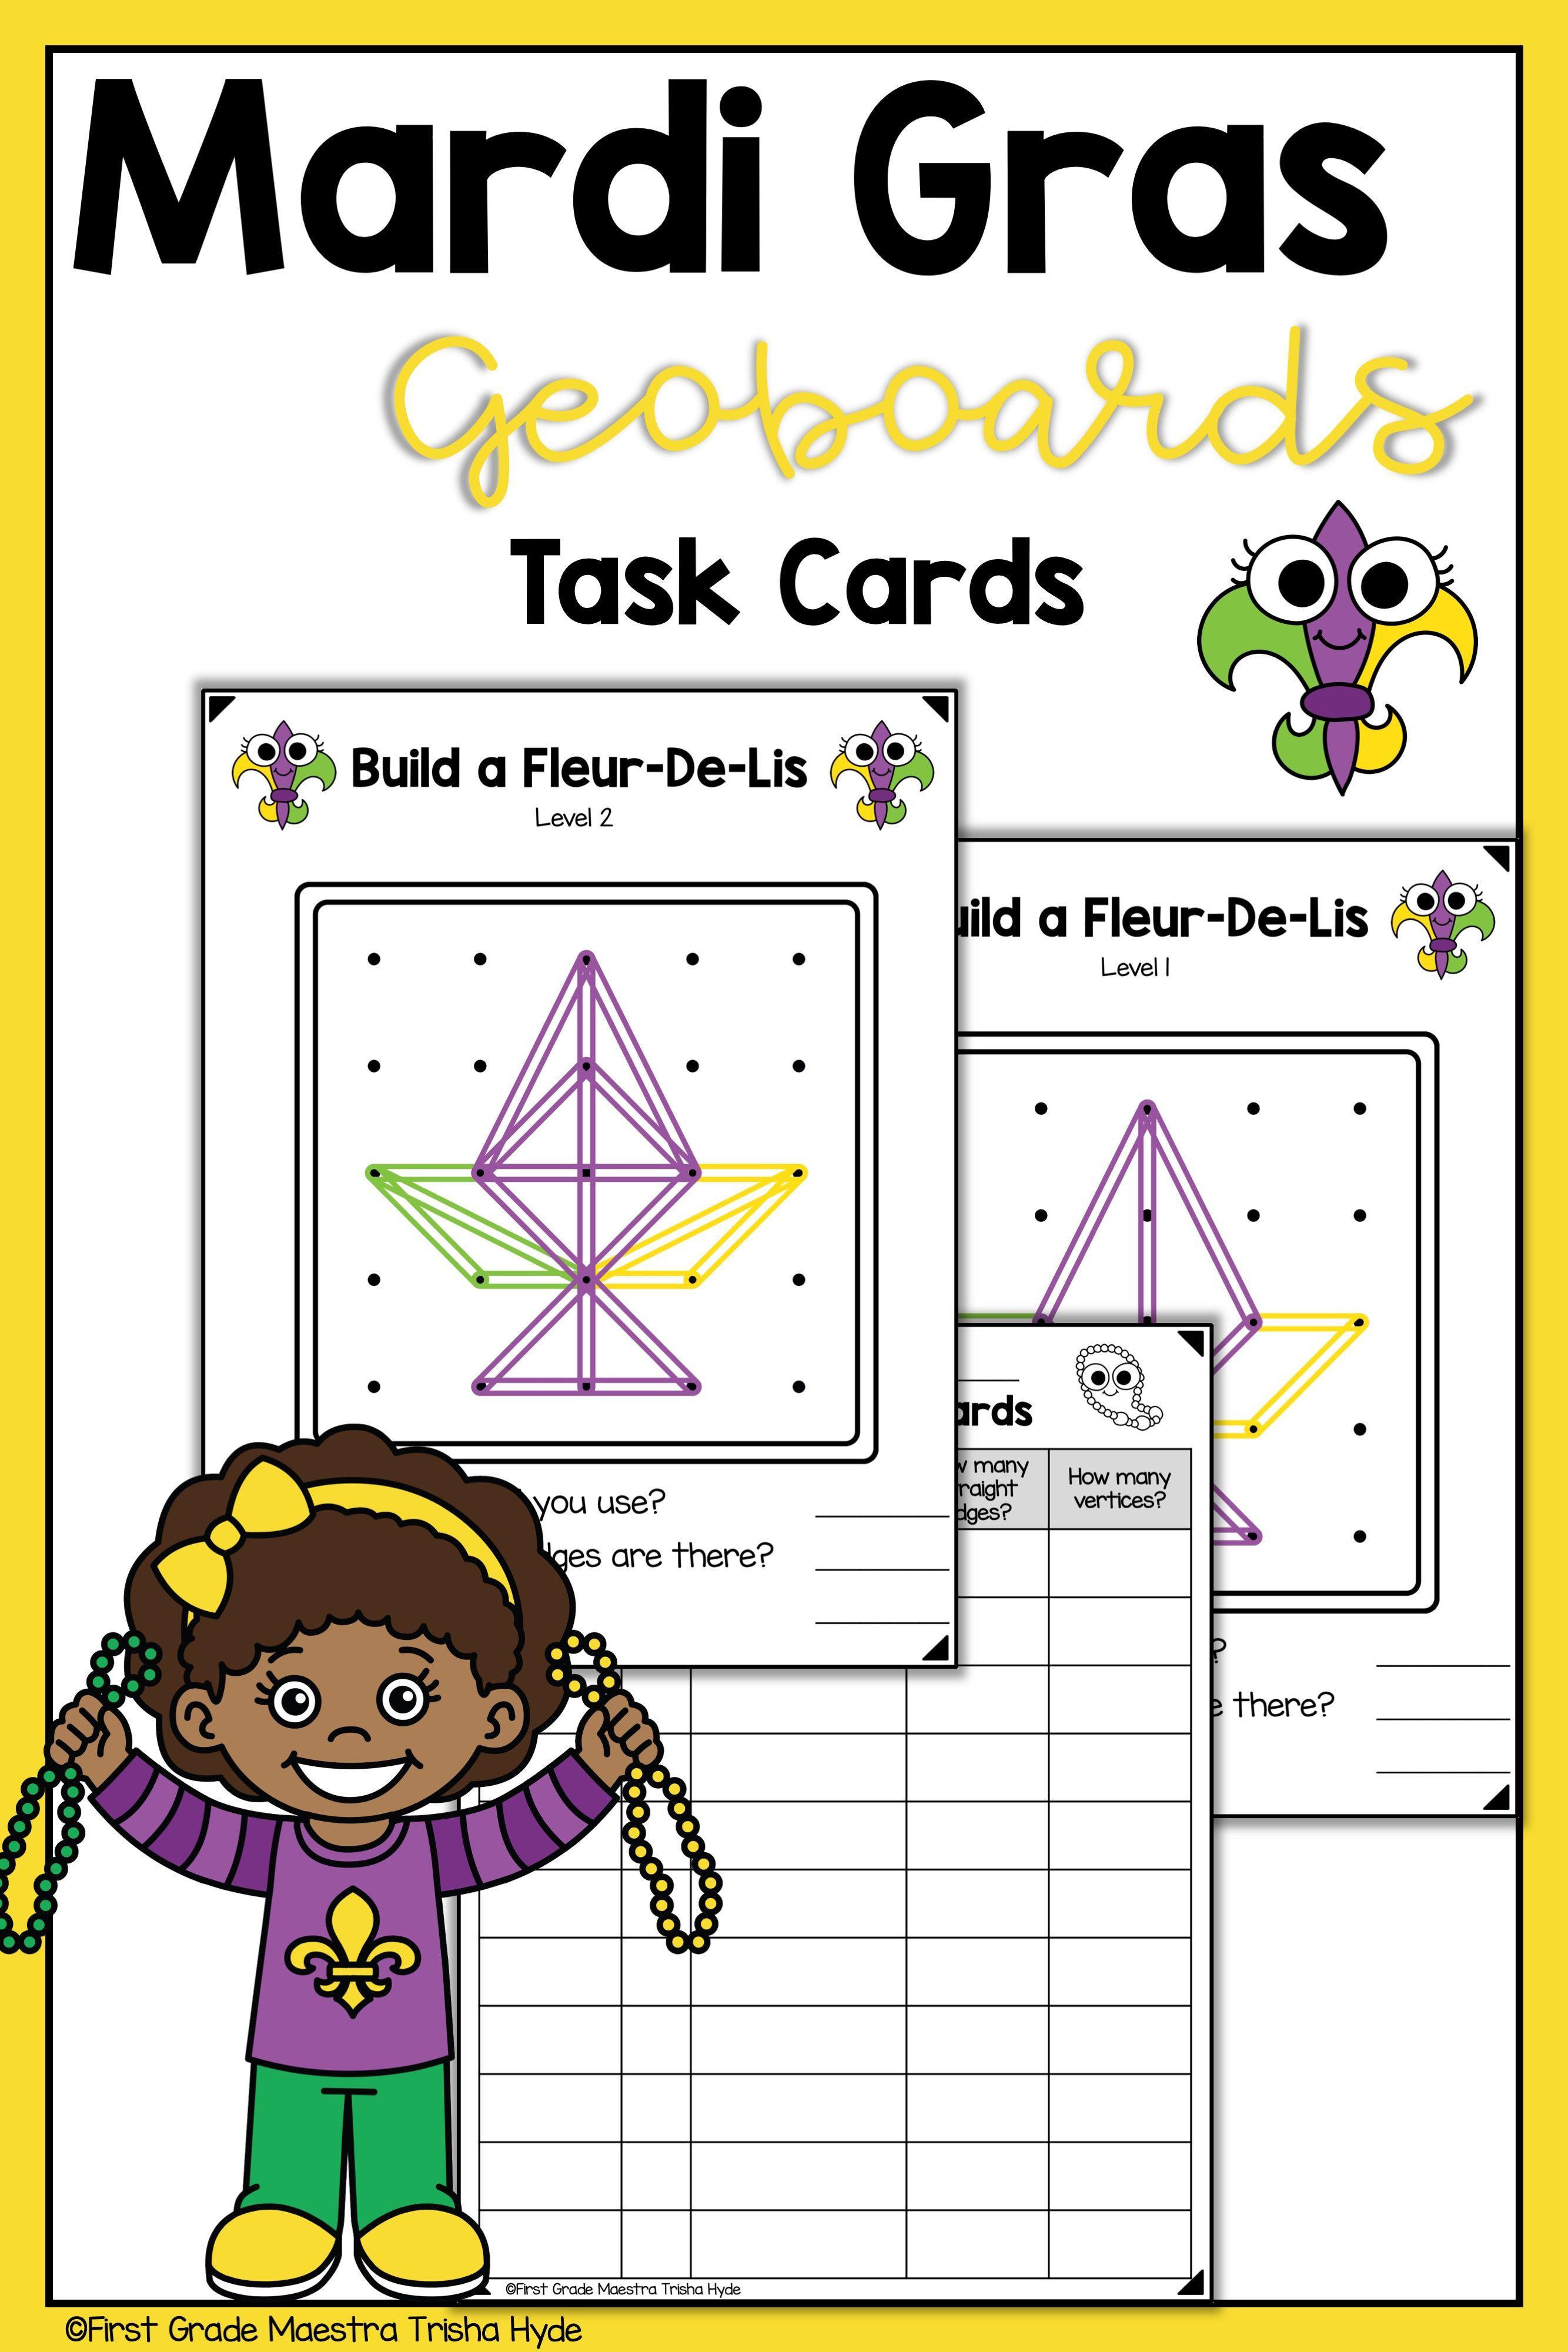 Mardi Gras Geoboard Task Cards